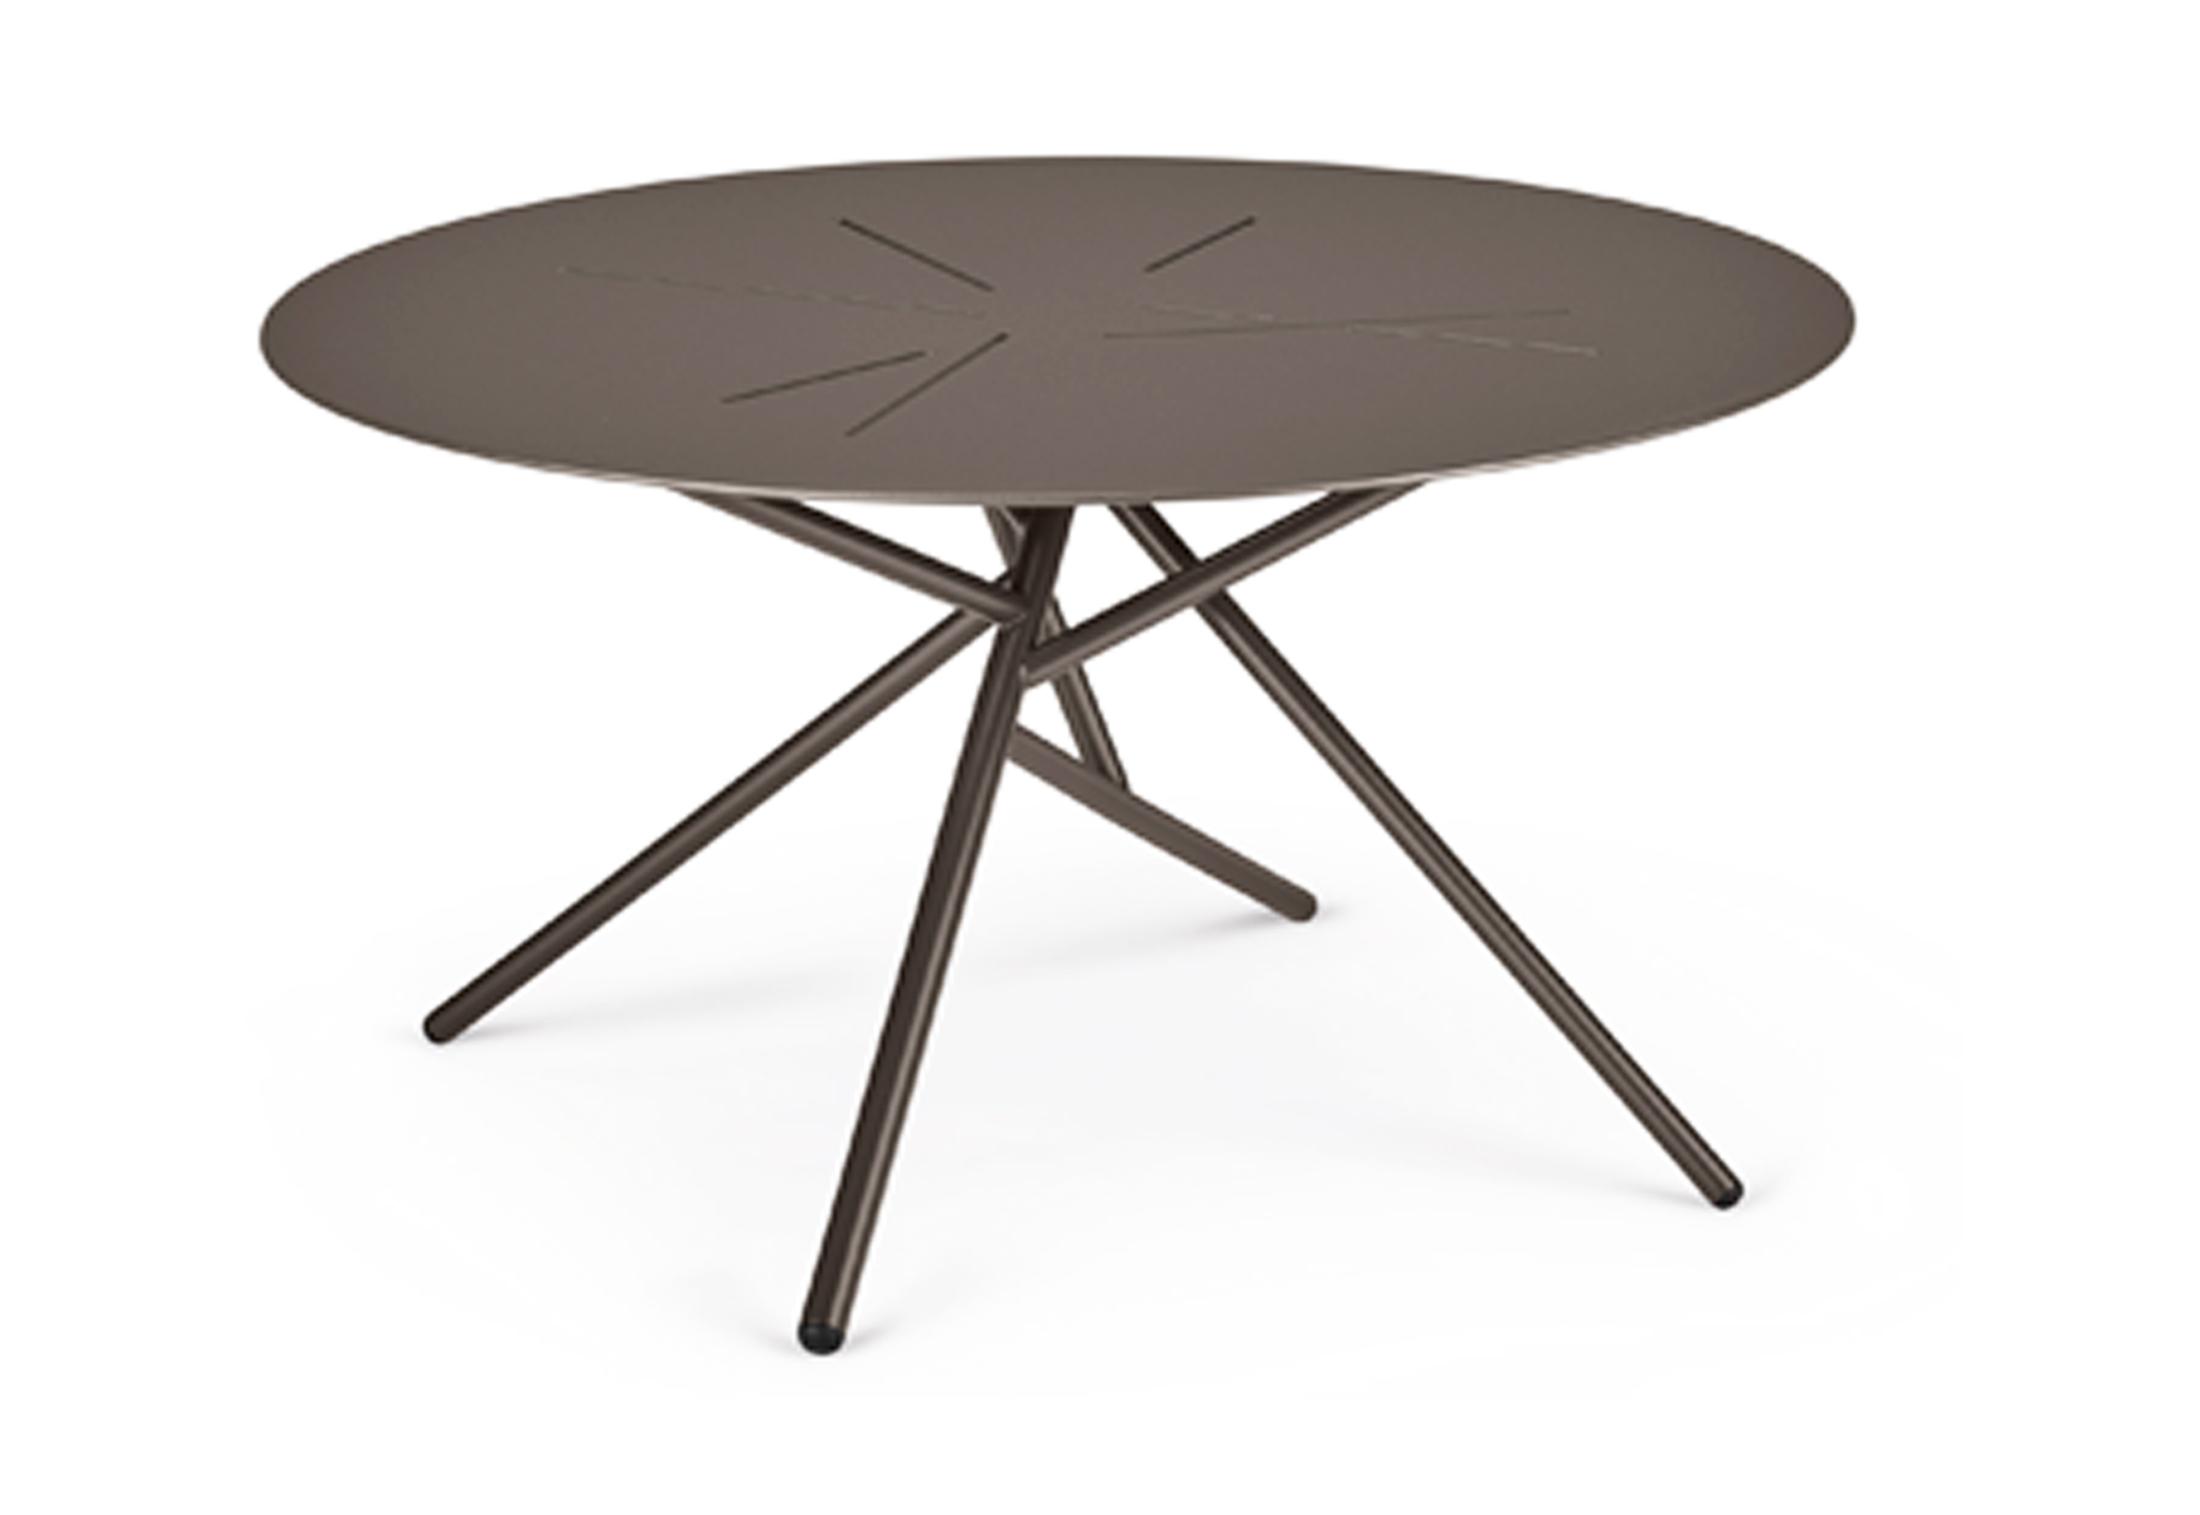 Mangrove Coffee Table By Dedon Stylepark